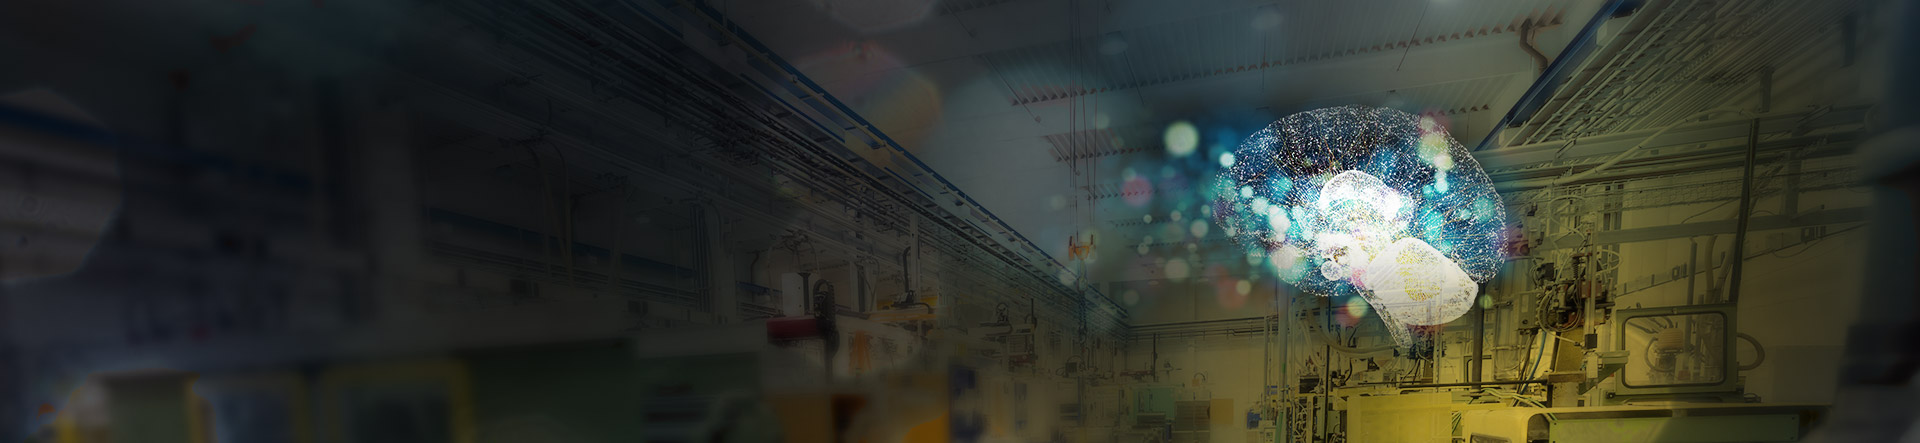 Deep Learning bokeh brain over Industrial warehouse ceiling